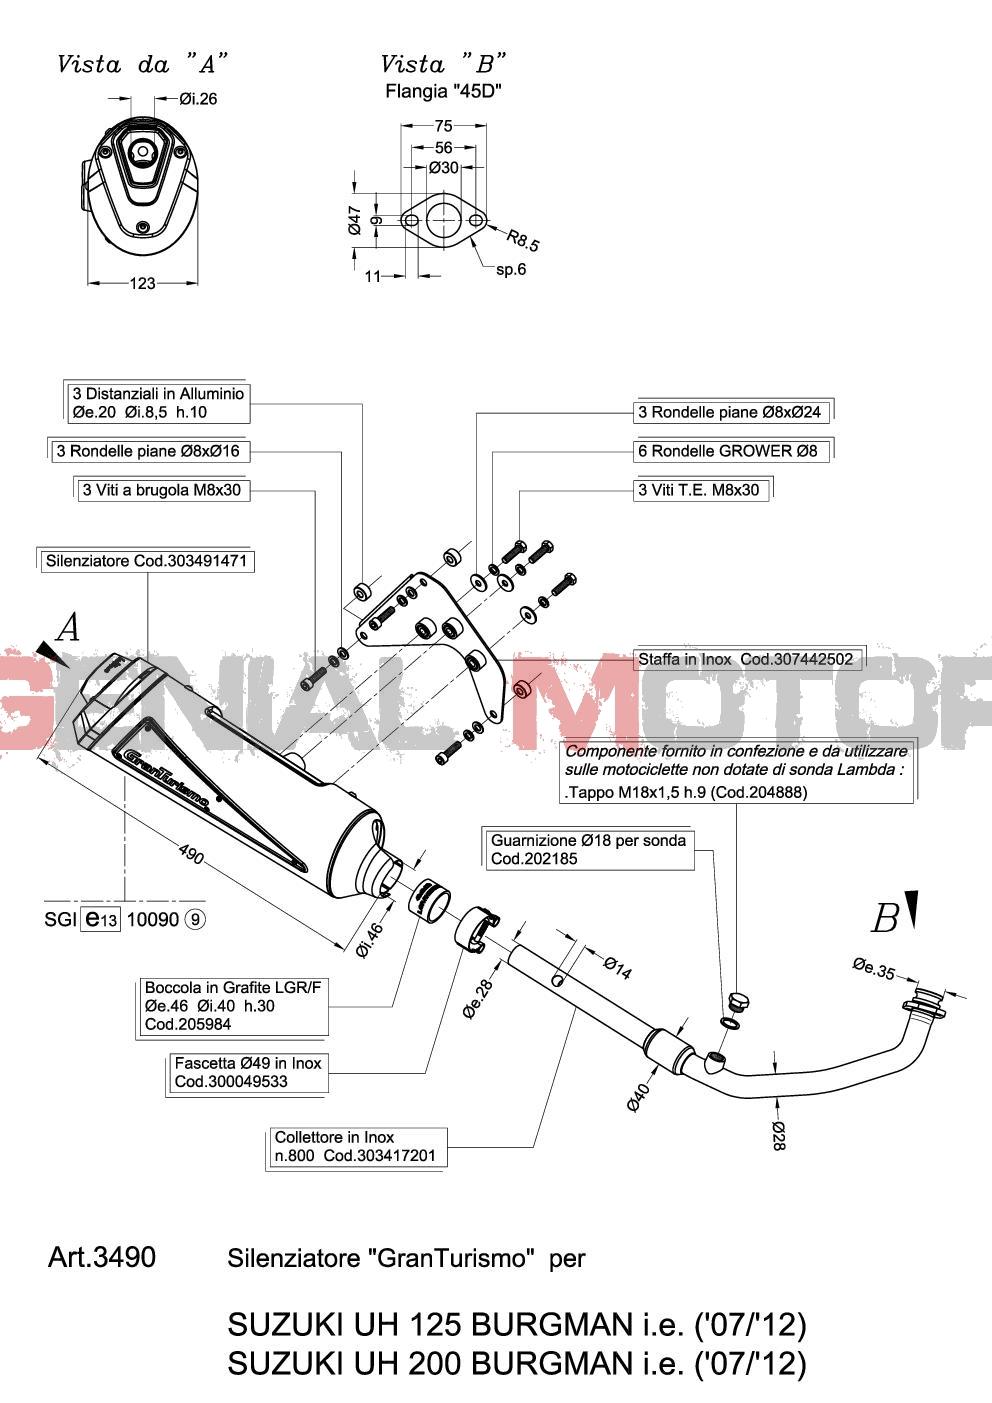 complete exhaust system leovince granturismo suzuki uh 200 burgman 2007 2013